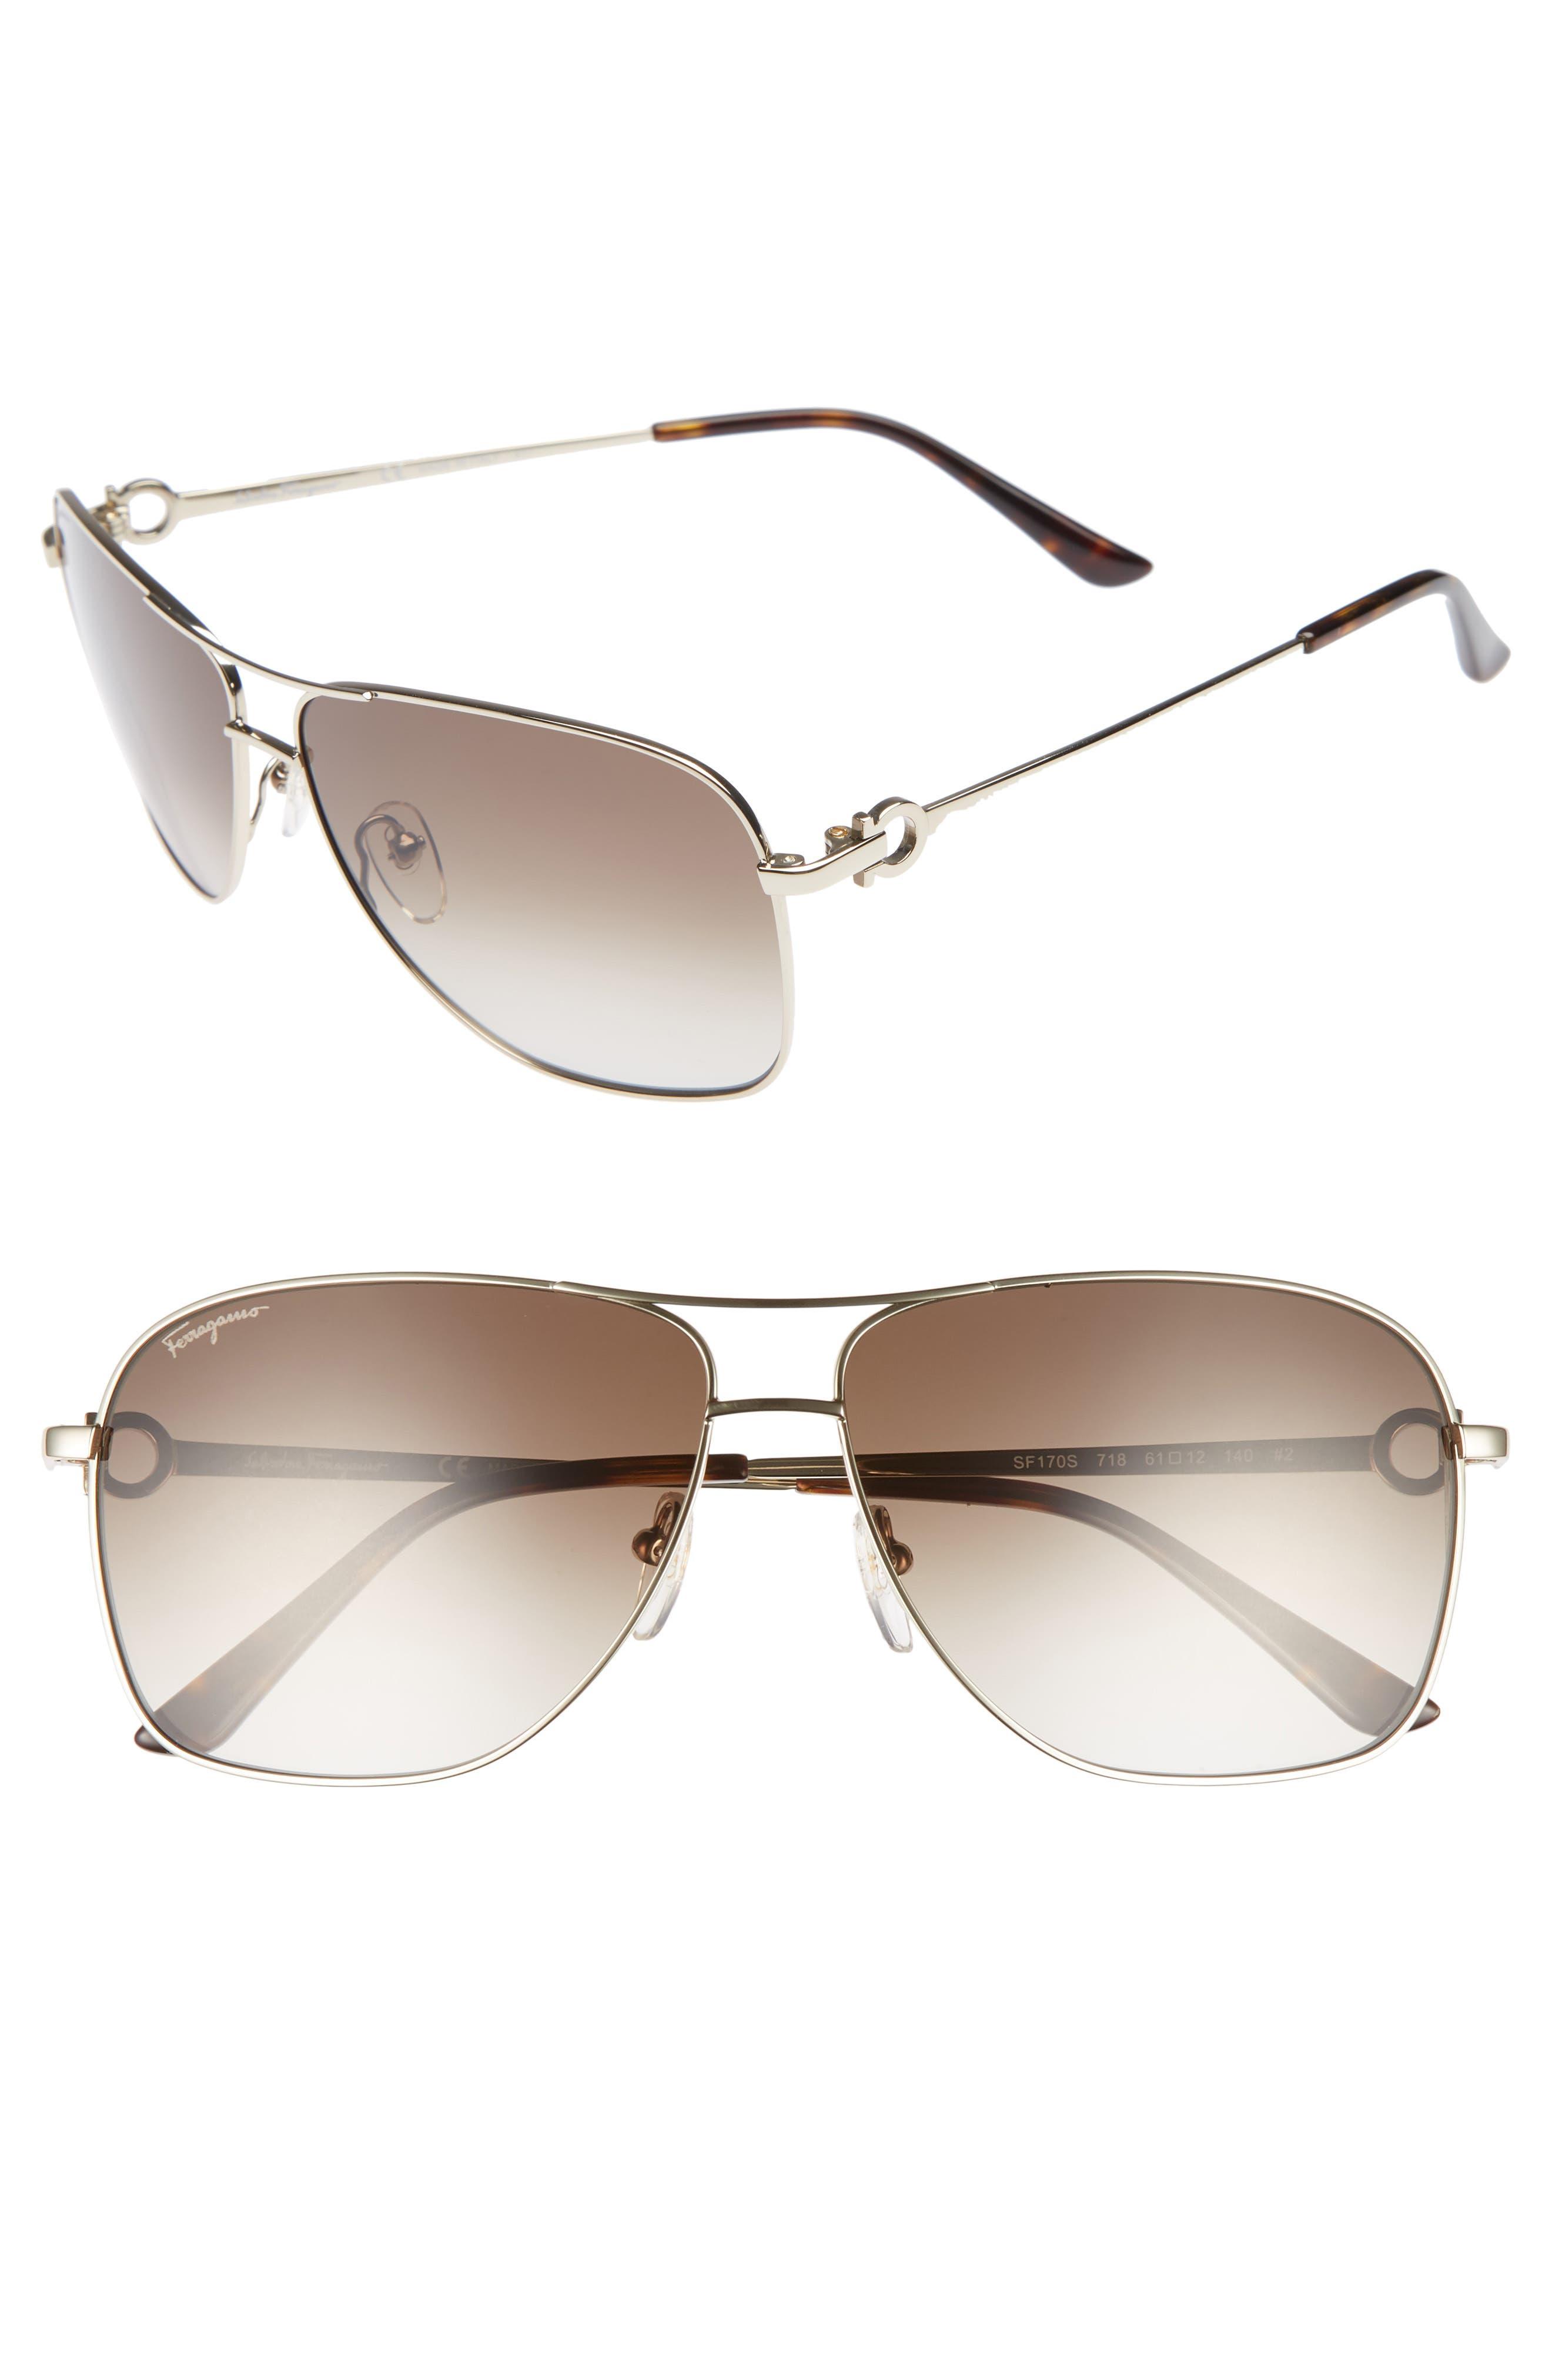 Alternate Image 1 Selected - Salvatore Ferragamo Gancio 61mm Aviator Sunglasses